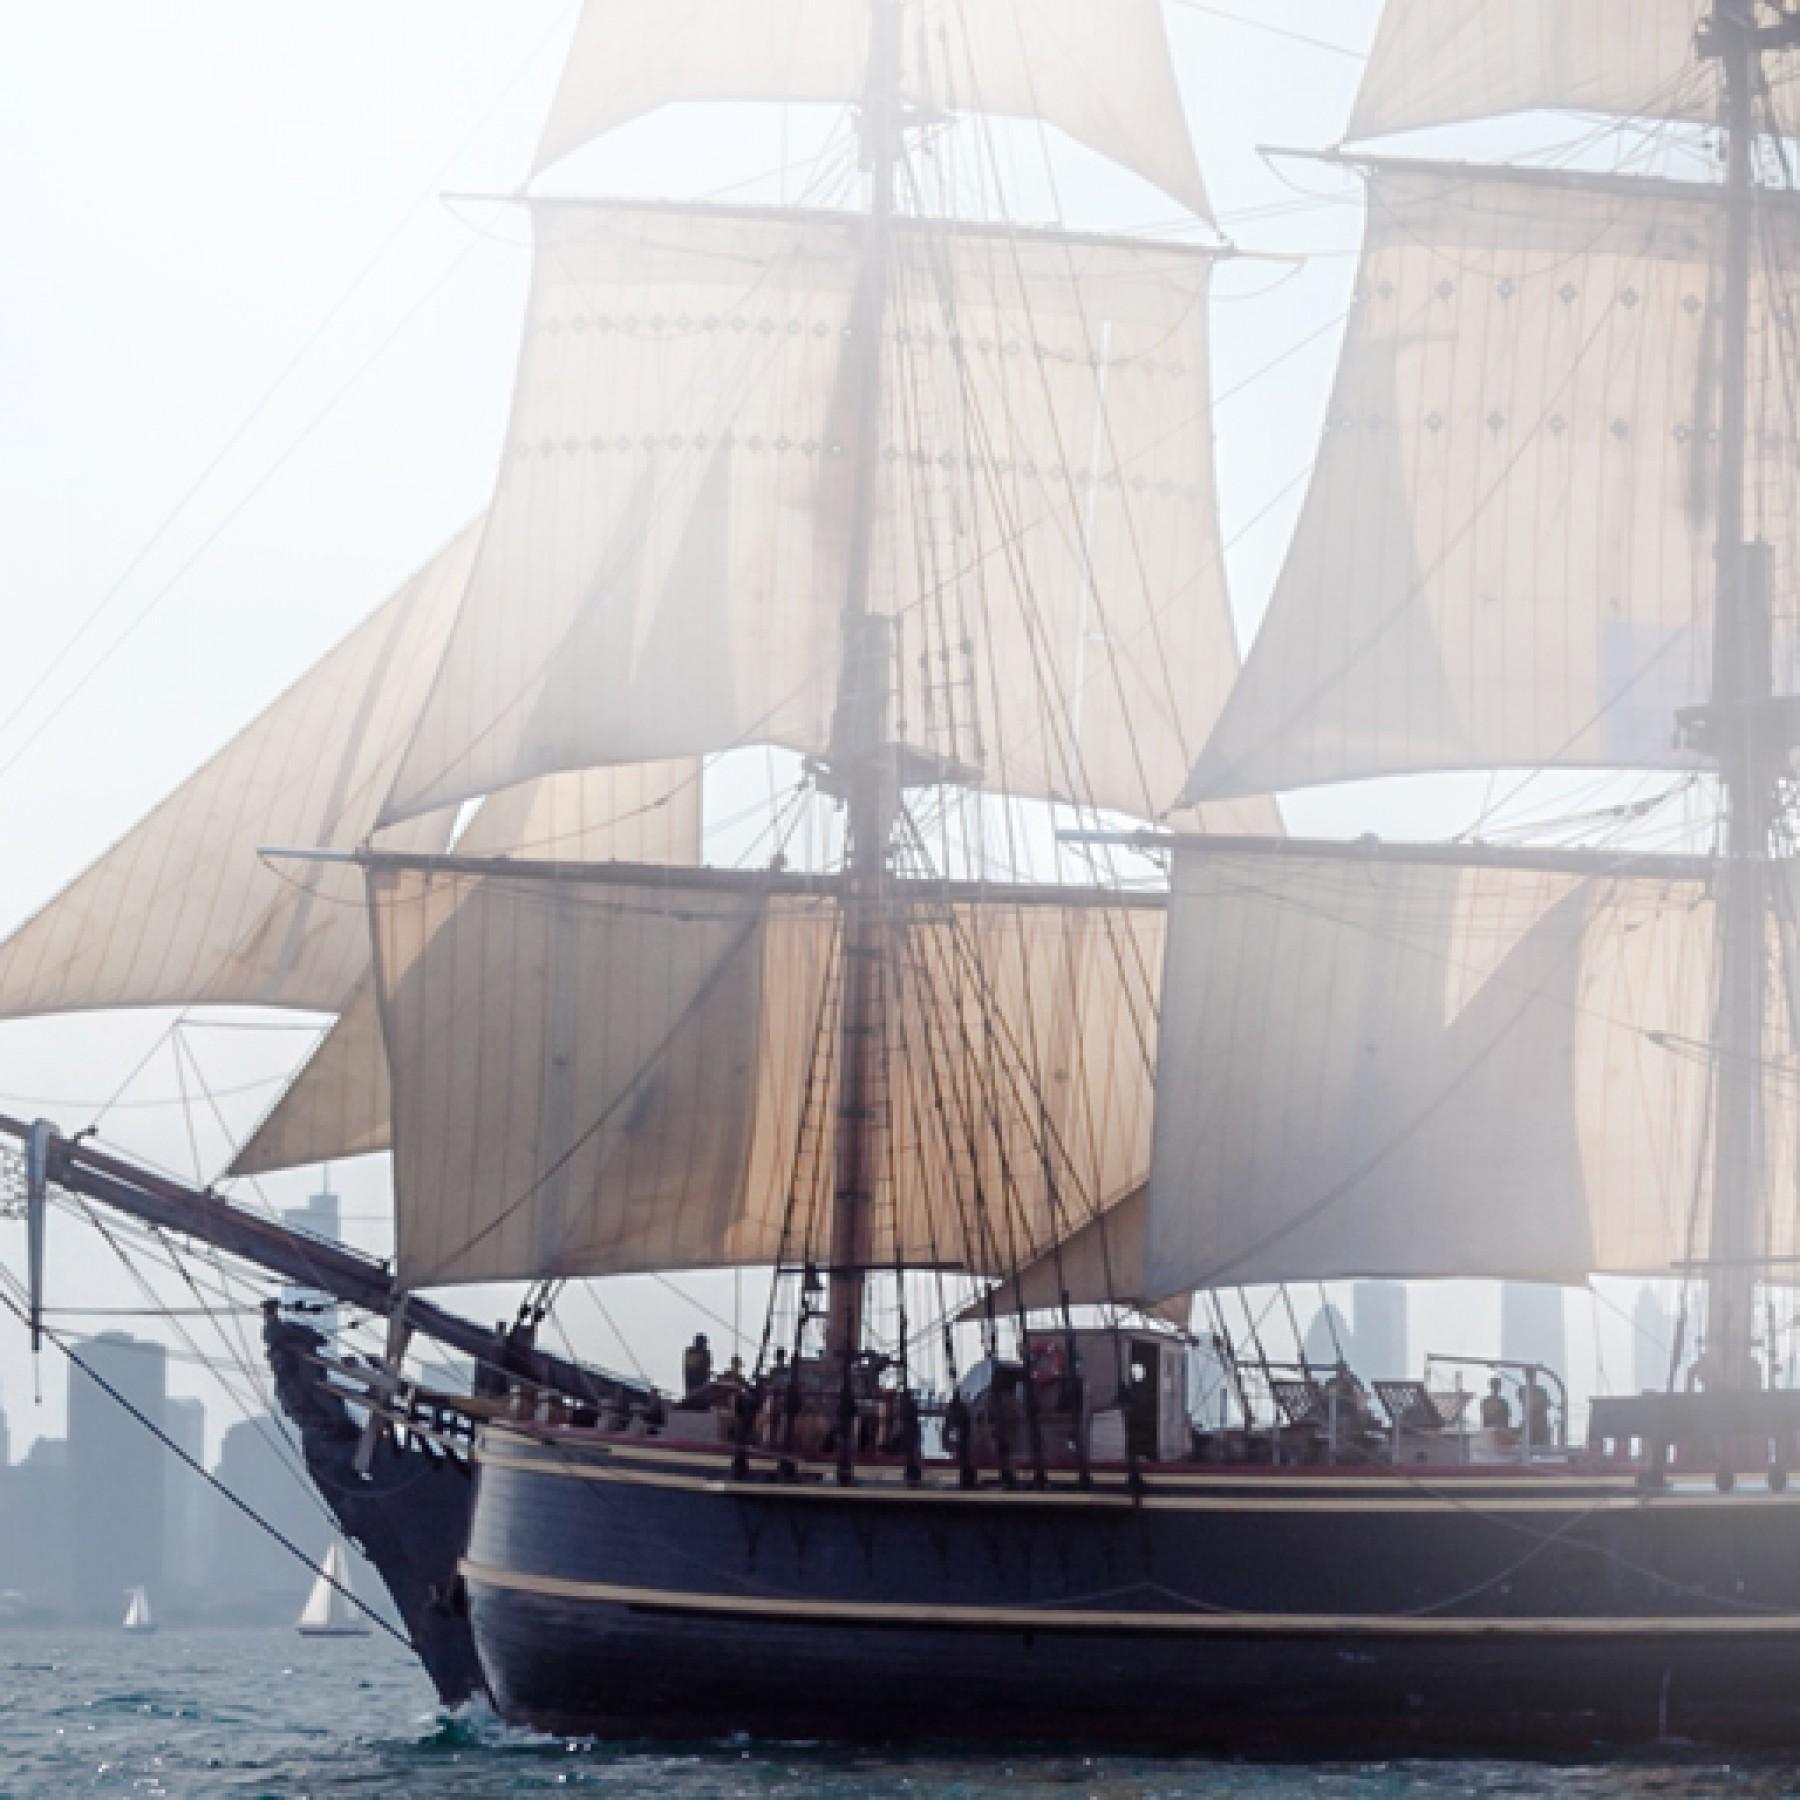 hms-bounty-history-adventure-adults-transport-main-location1